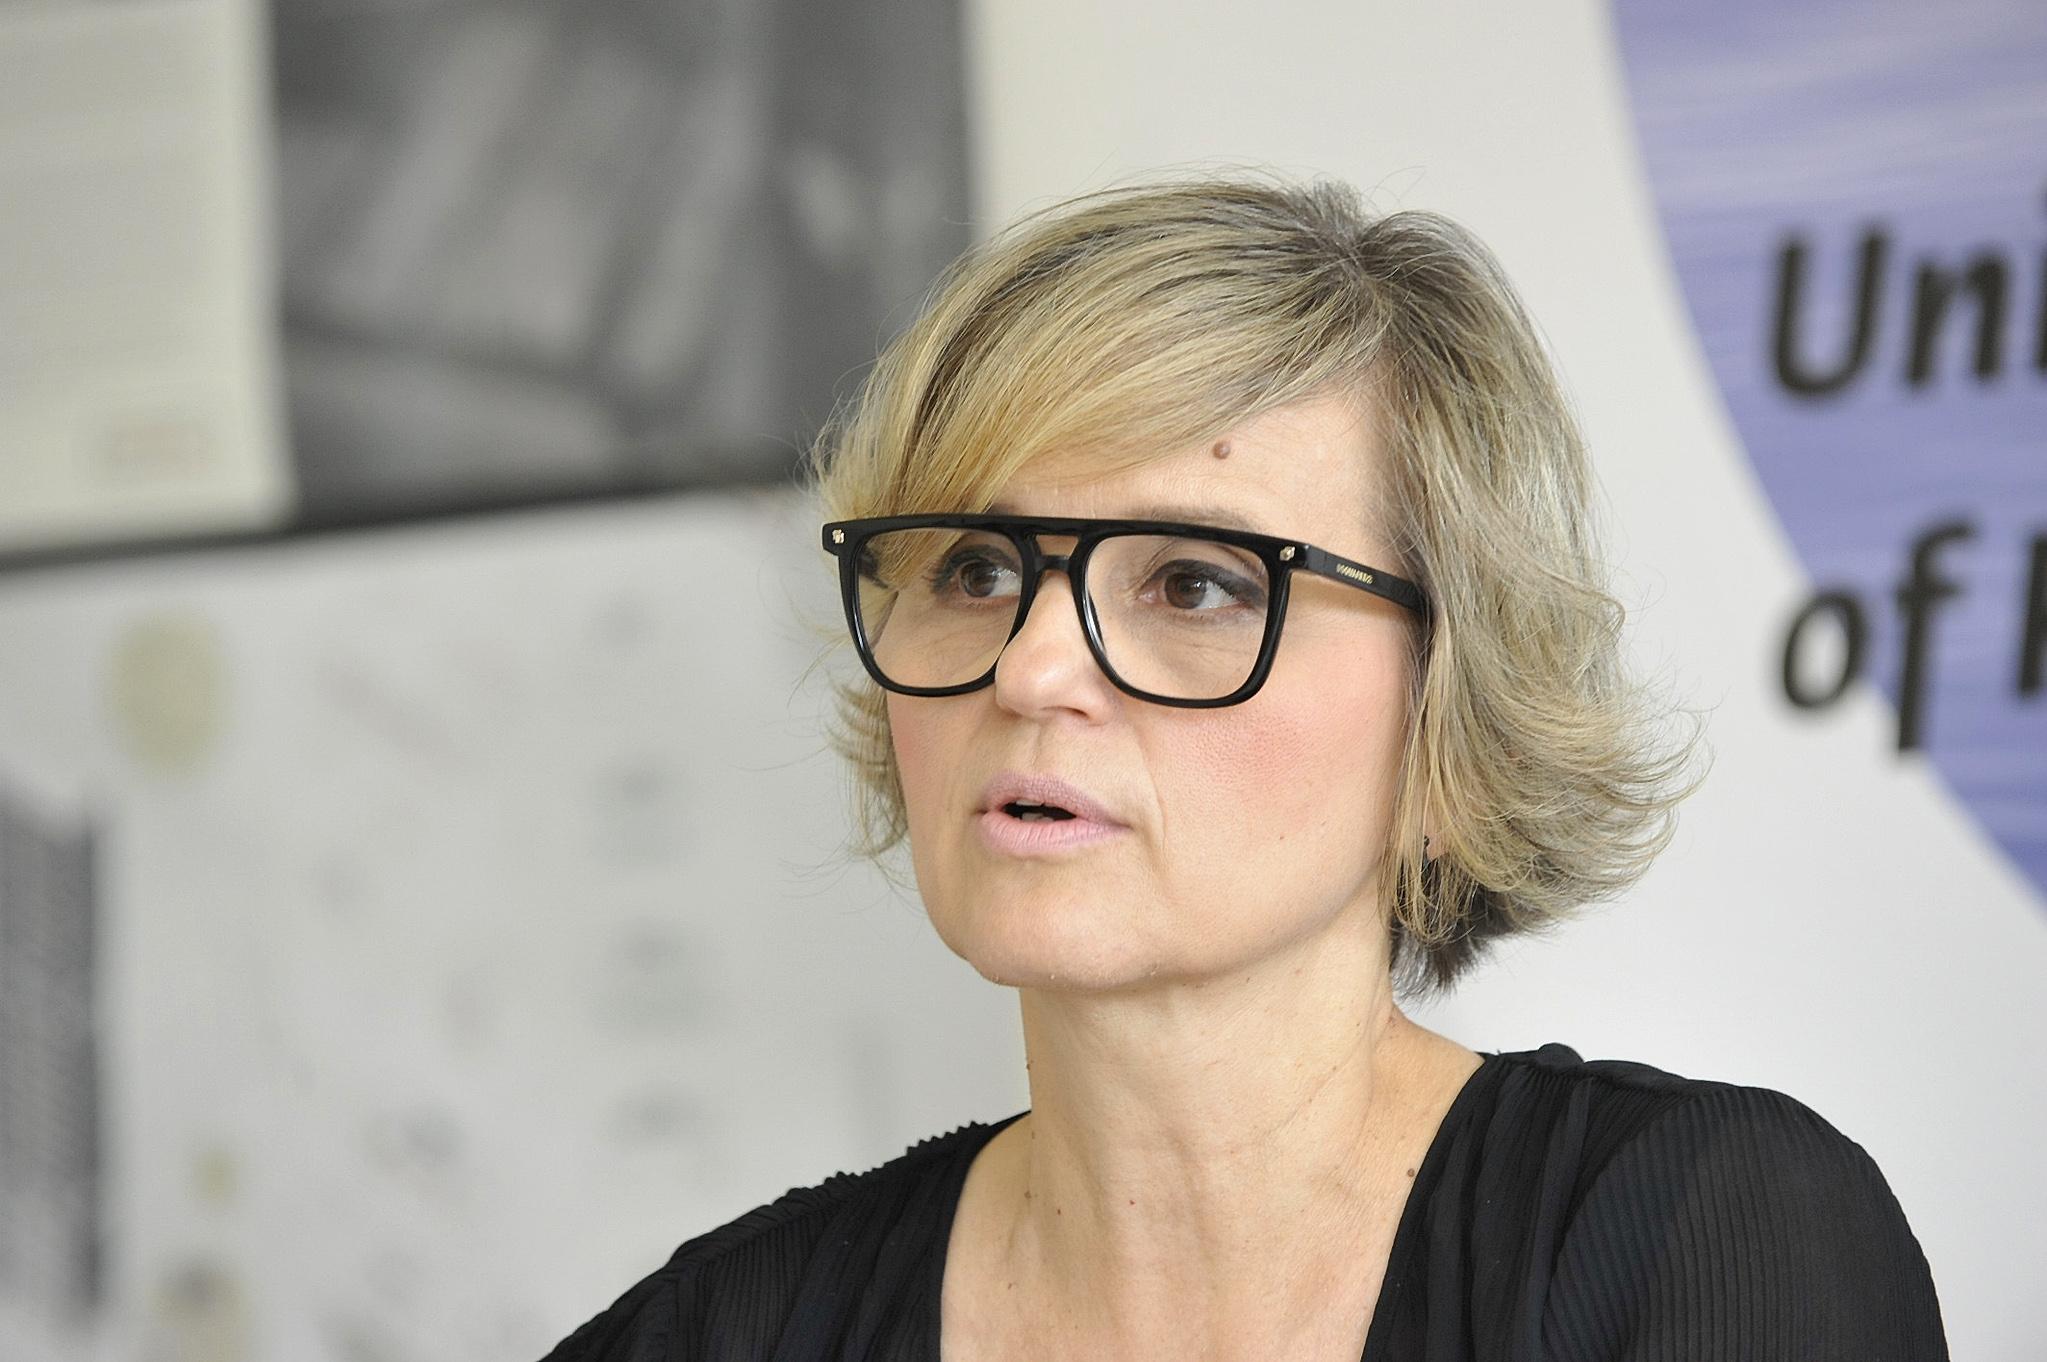 Snježana Prijić Samaržija / NL arhiva